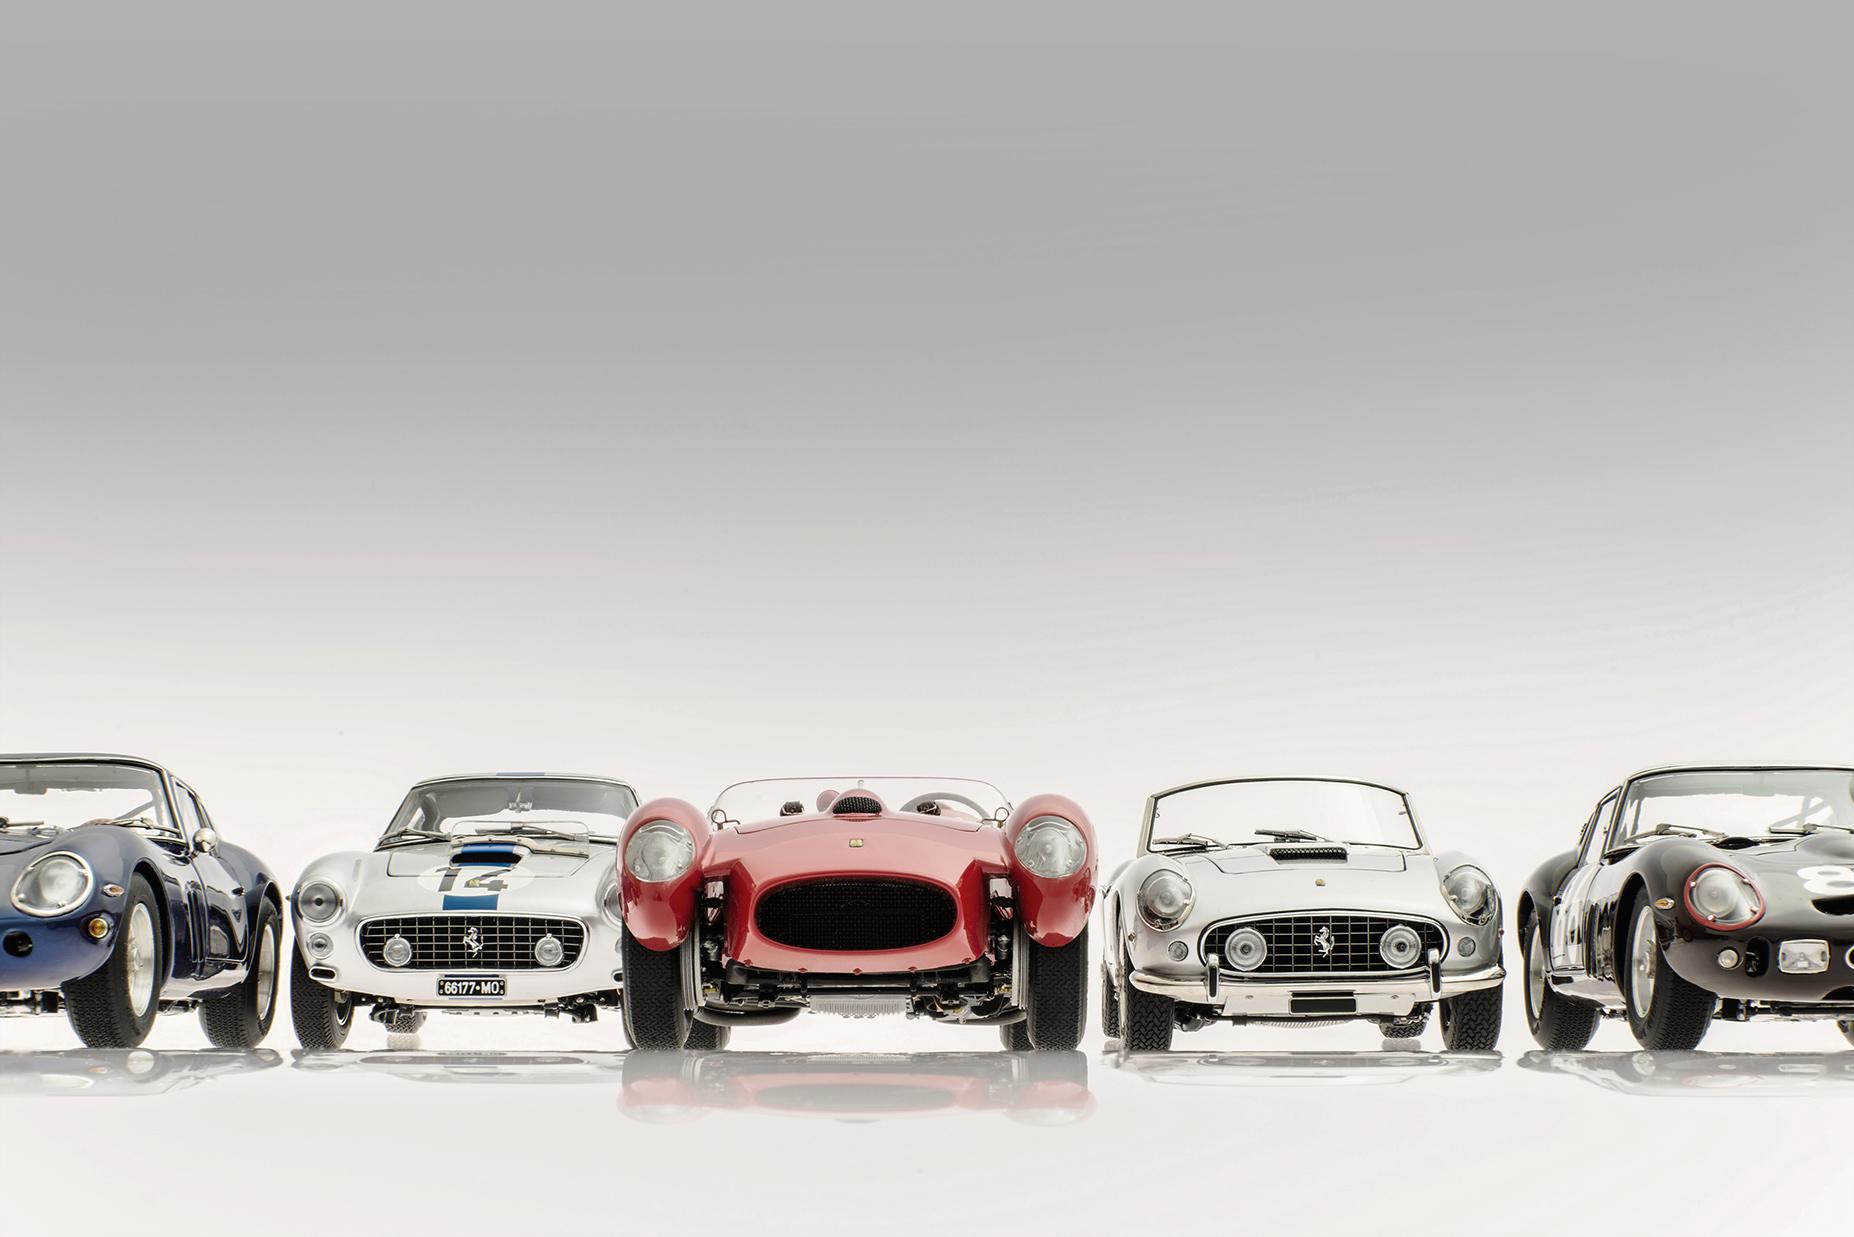 cmc models background RACING HEROES 1854x1237